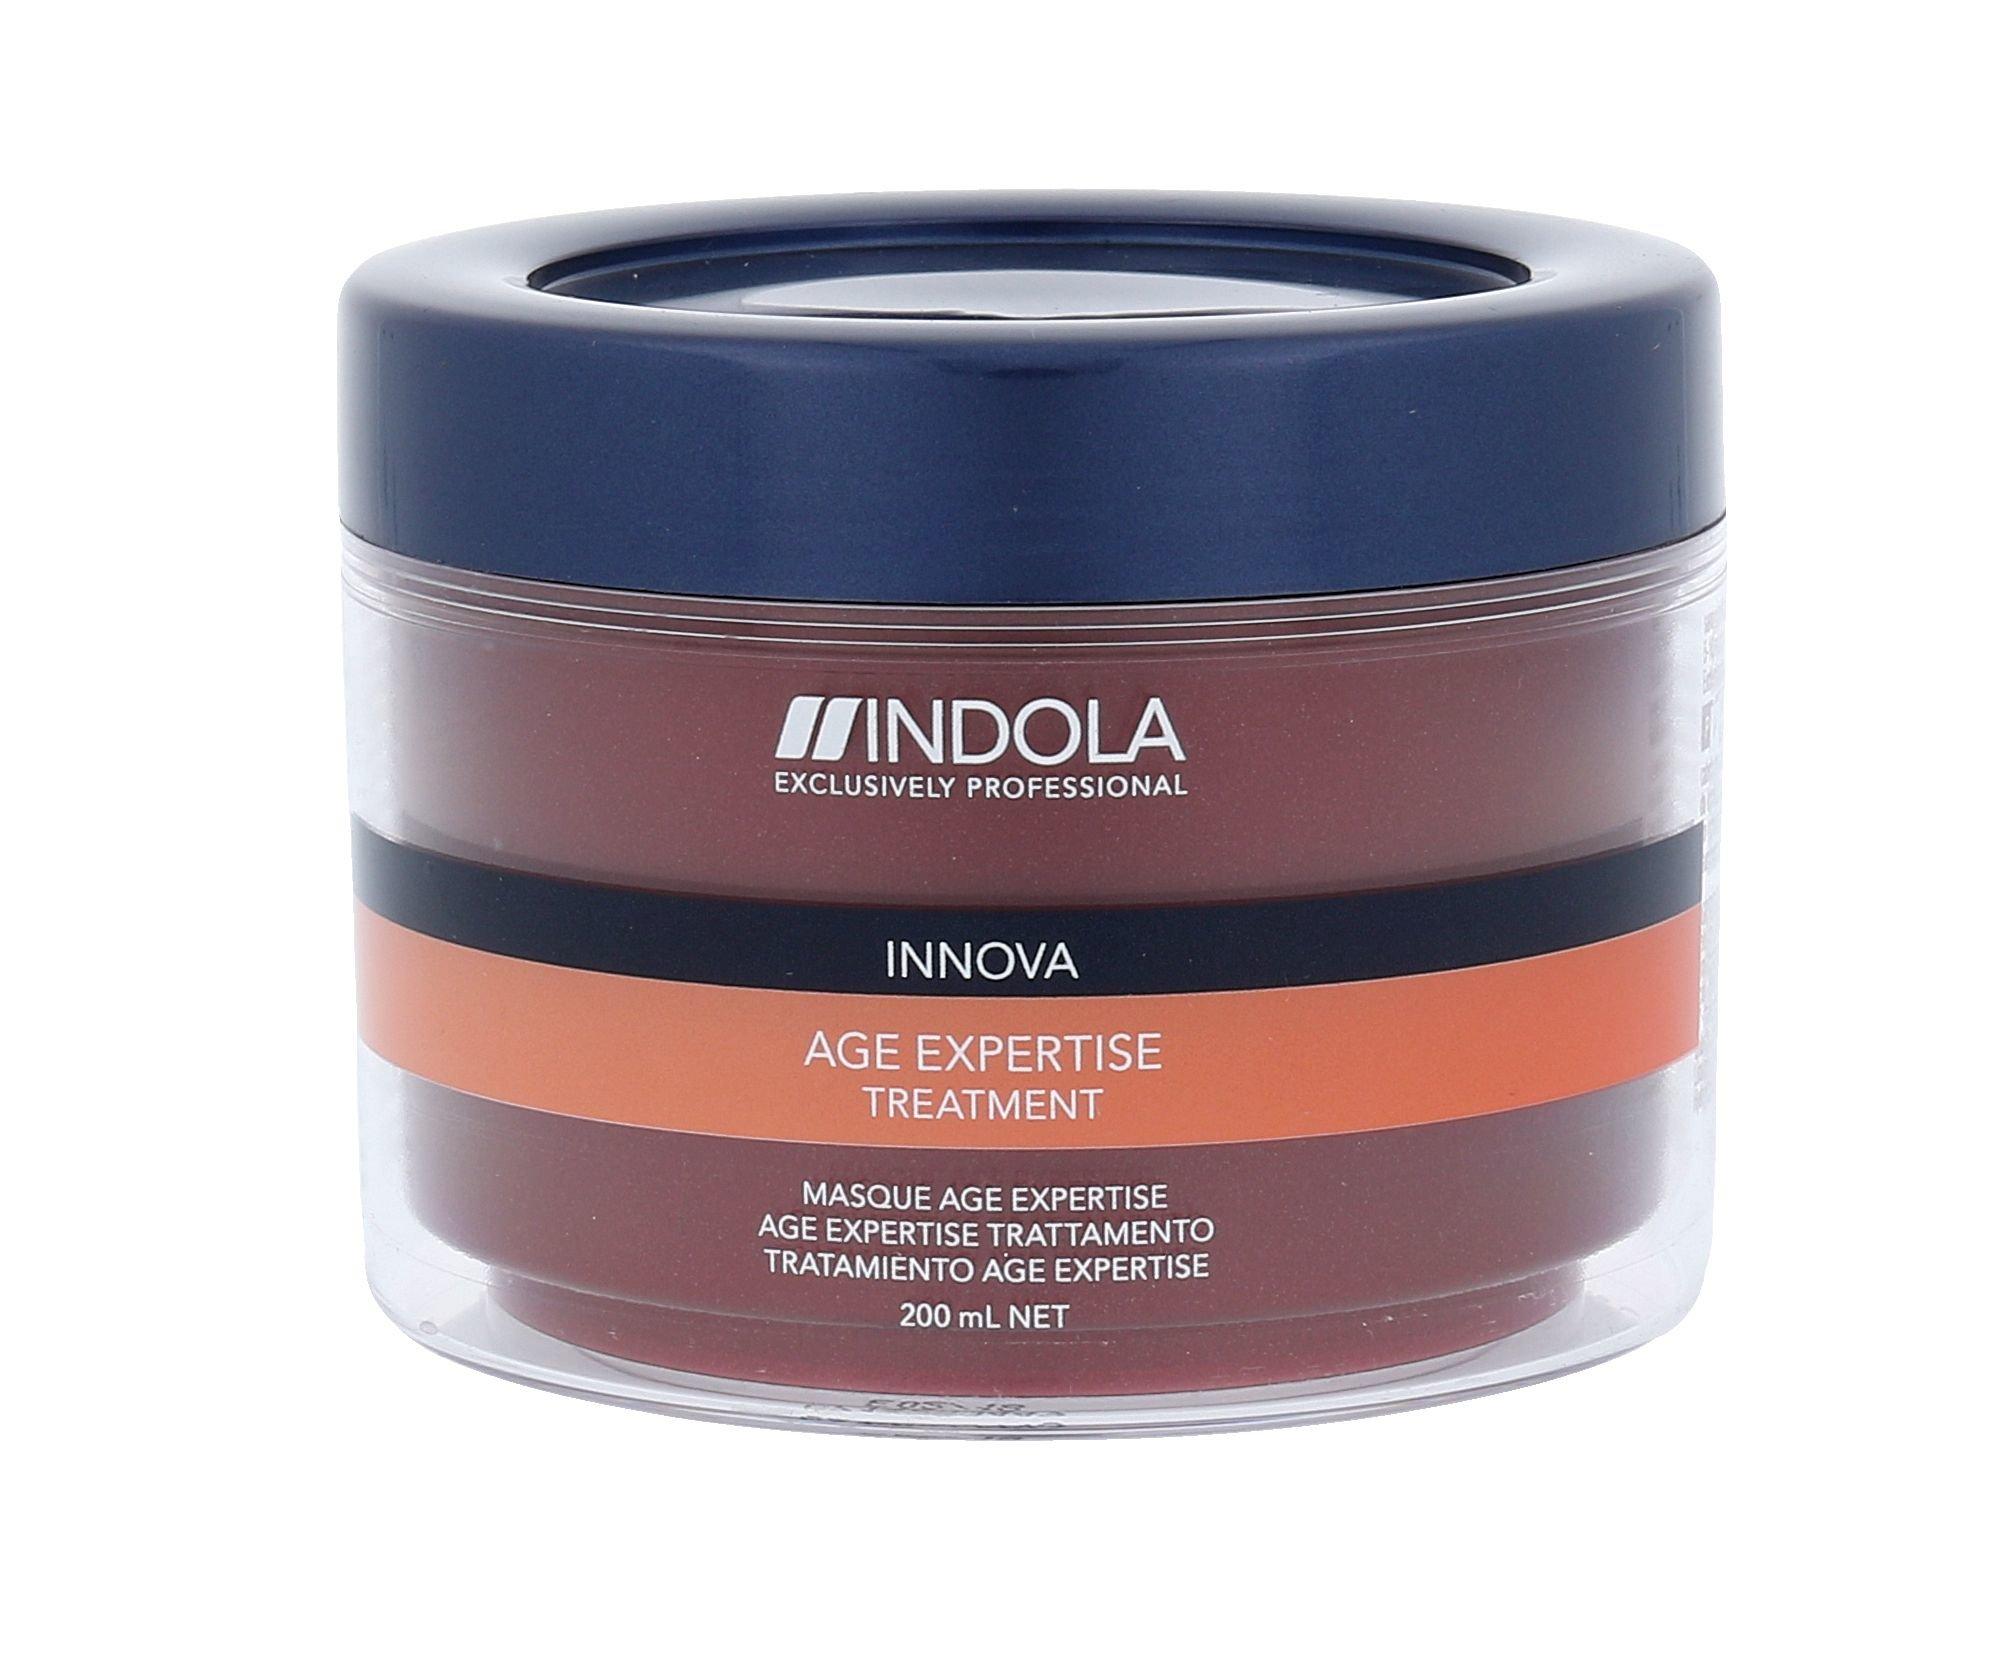 Indola Innova Age Expertise Cosmetic 200ml